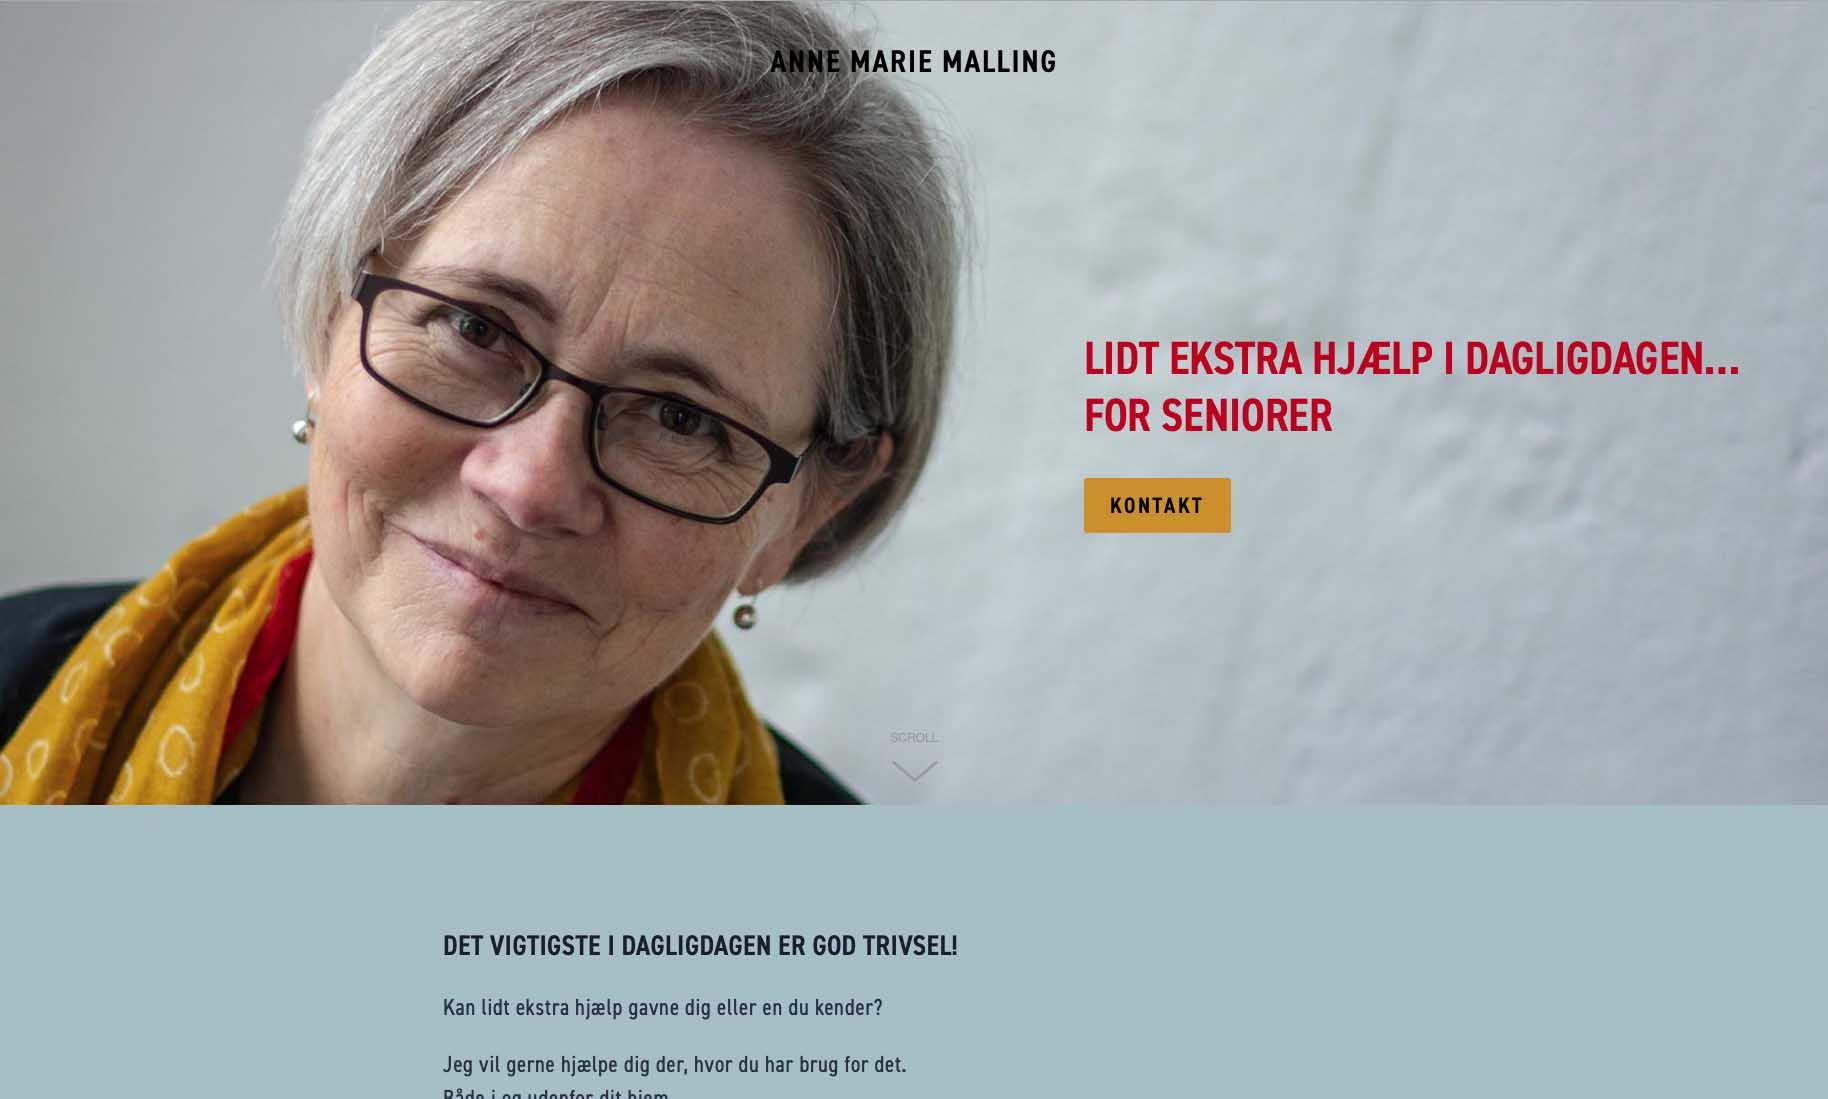 Website: Anne Marie Malling - seniorhjælp